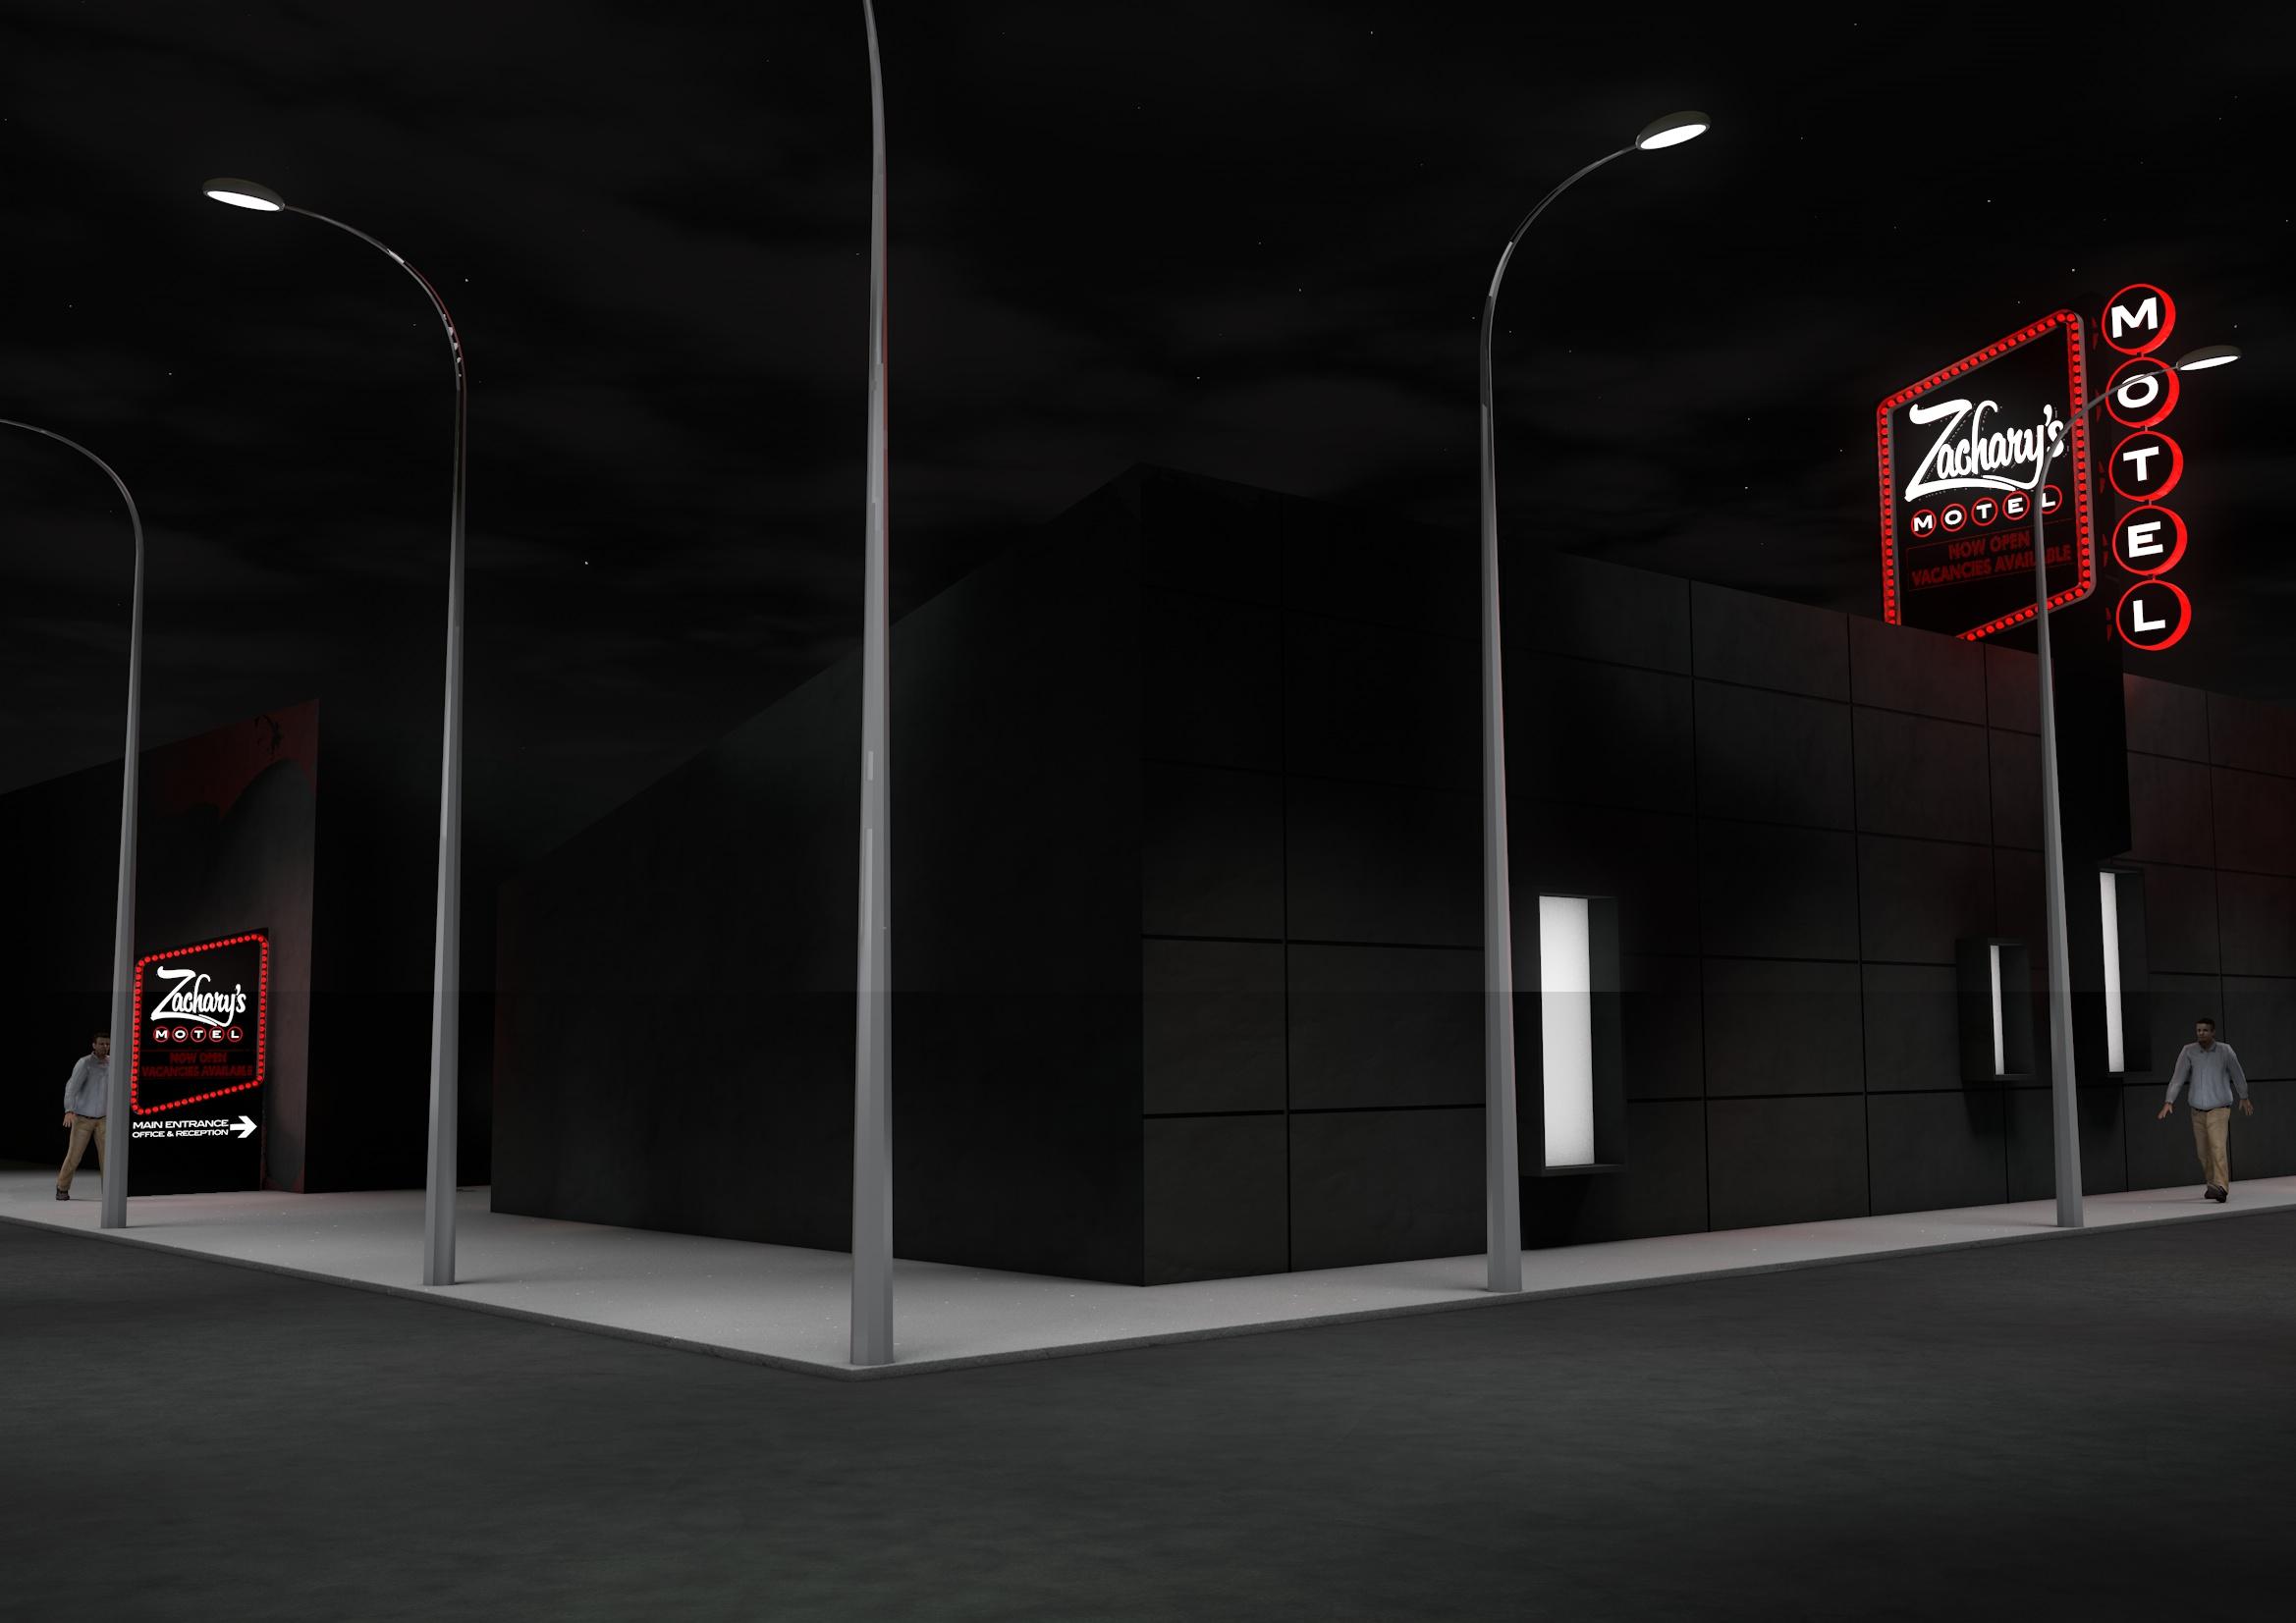 Zachary's Motel Concept 2 Street Night